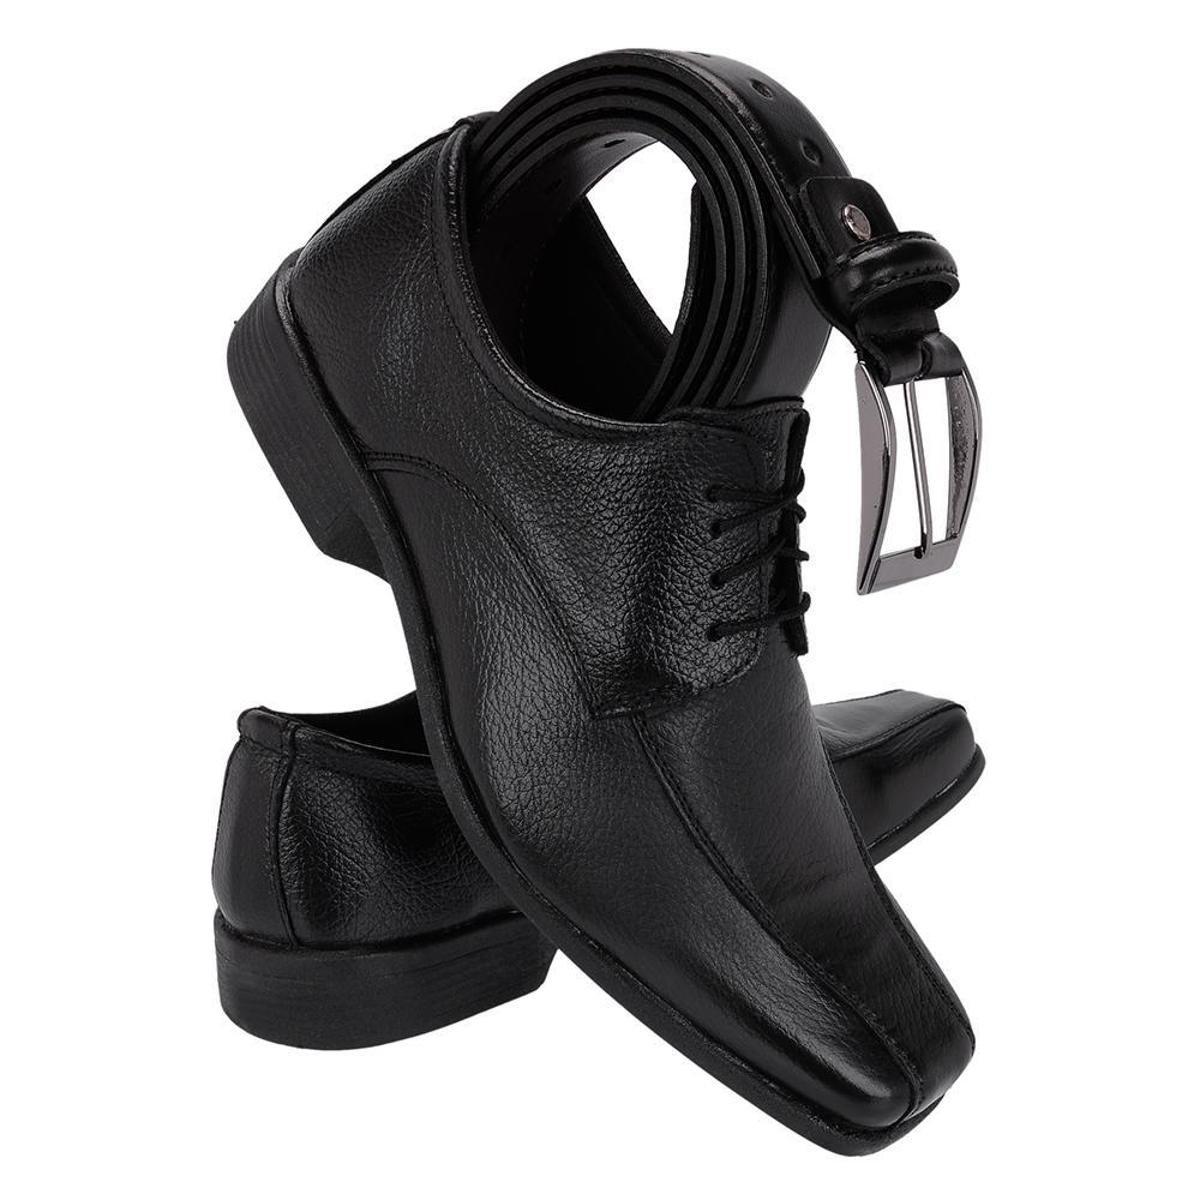 Kit Masculino Cinto Sapato Shoes Sapato Kit Preto Fox Social Couro 0qpdq ... 4aace0d46e796